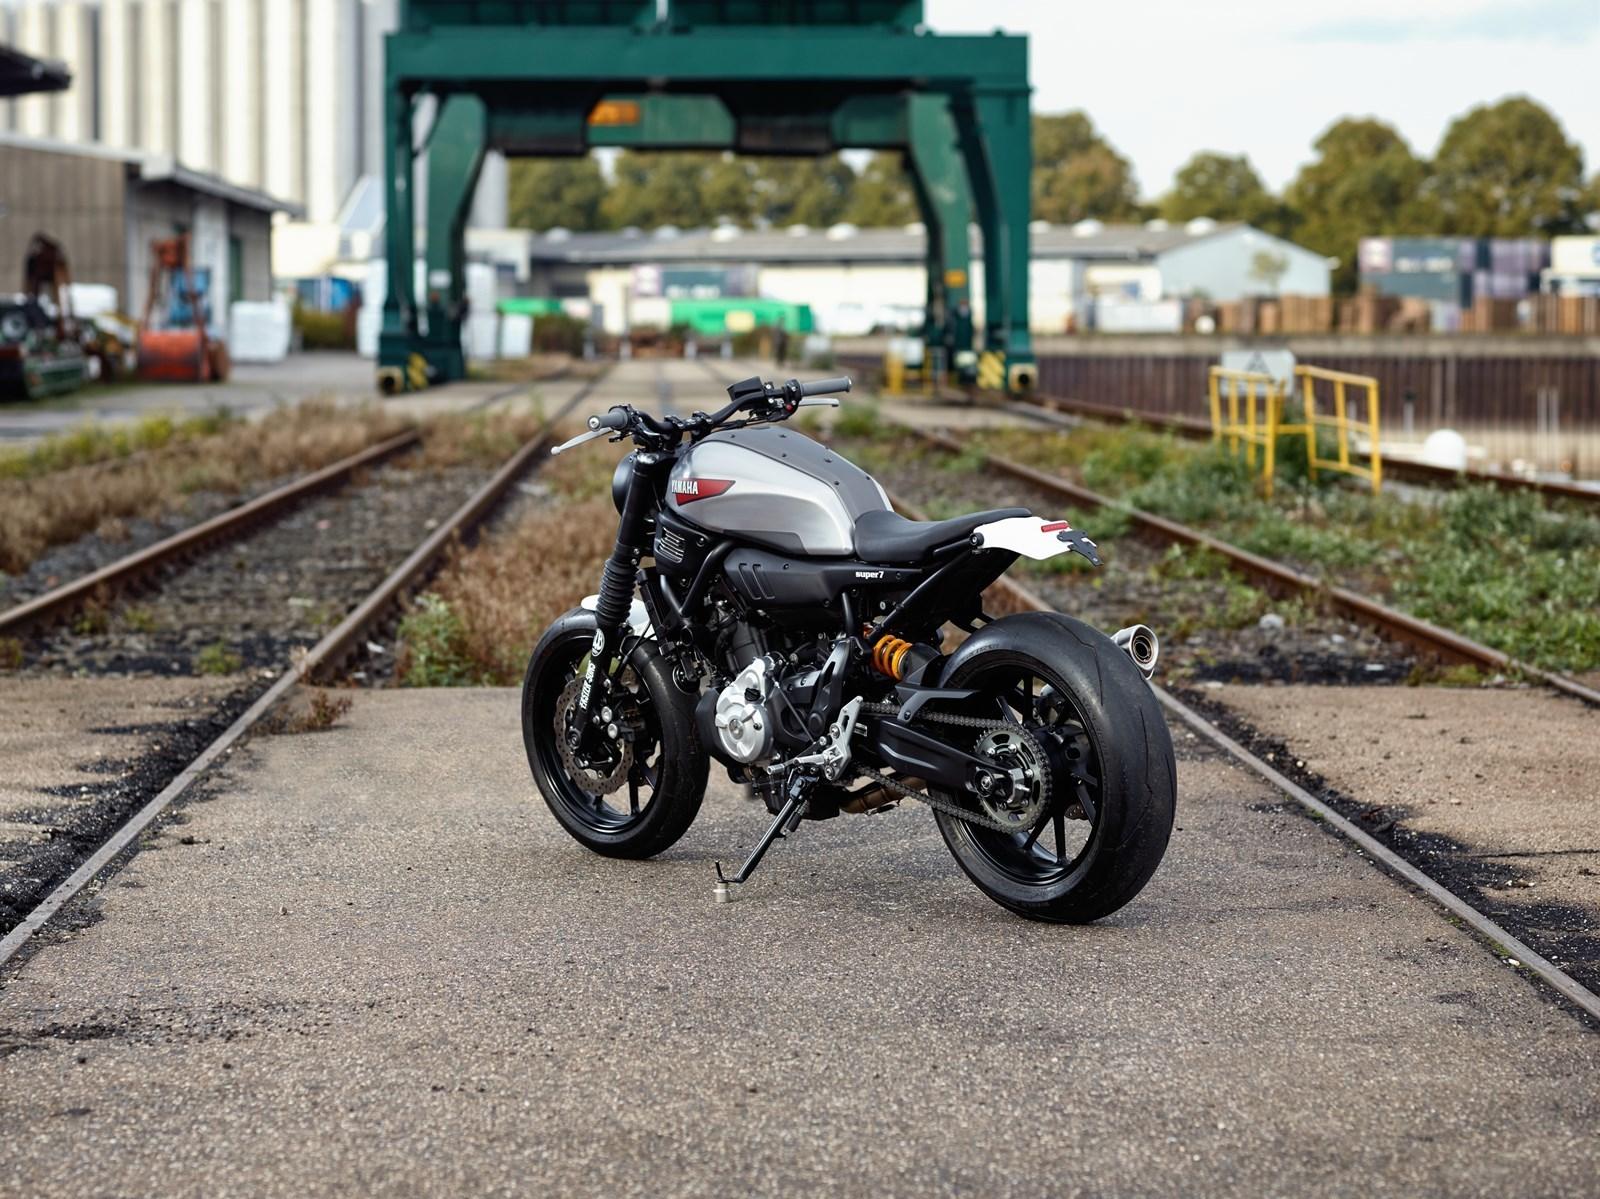 Foto de Yamaha XSR700 Super 7 by JvB-Moto (13/25)